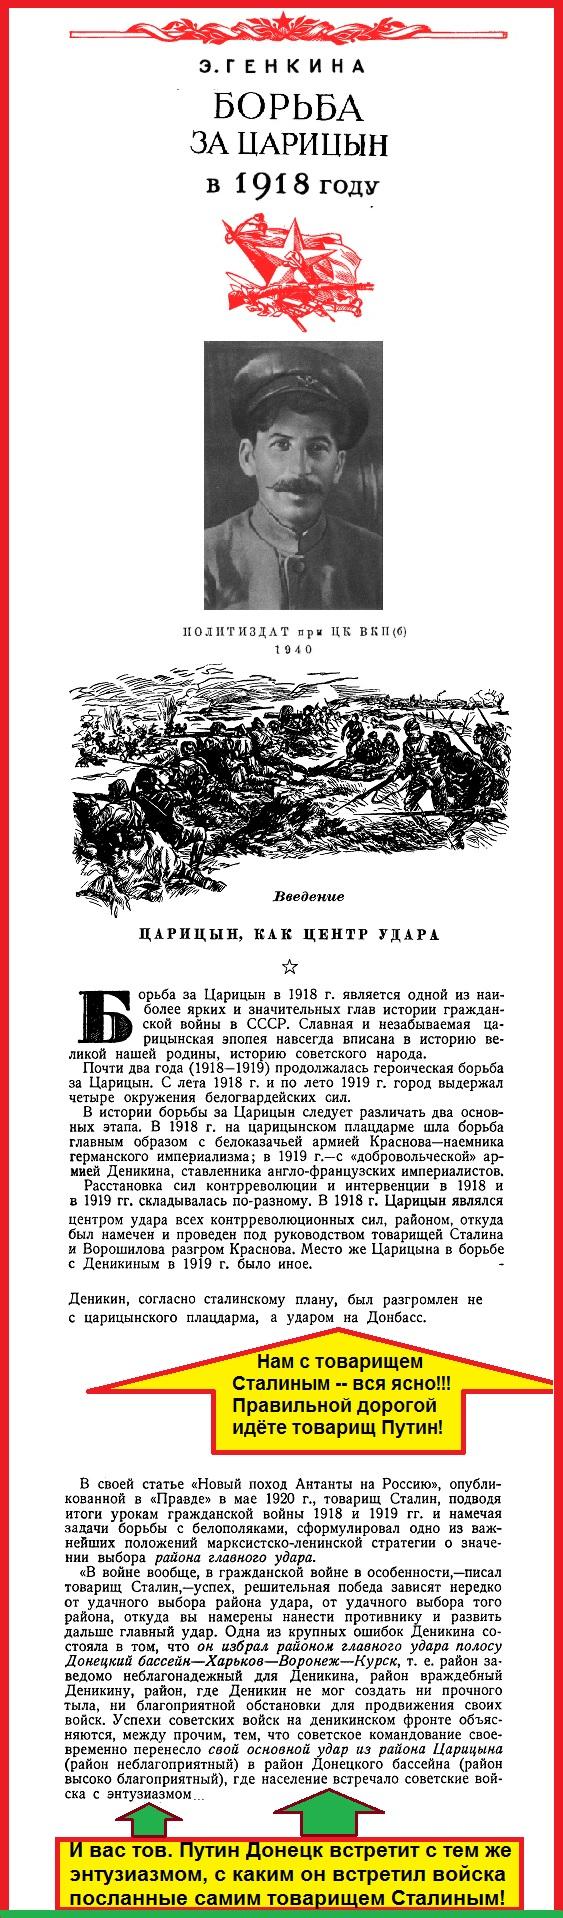 Донецк, Путин, Украина, Сталин, Гражданская